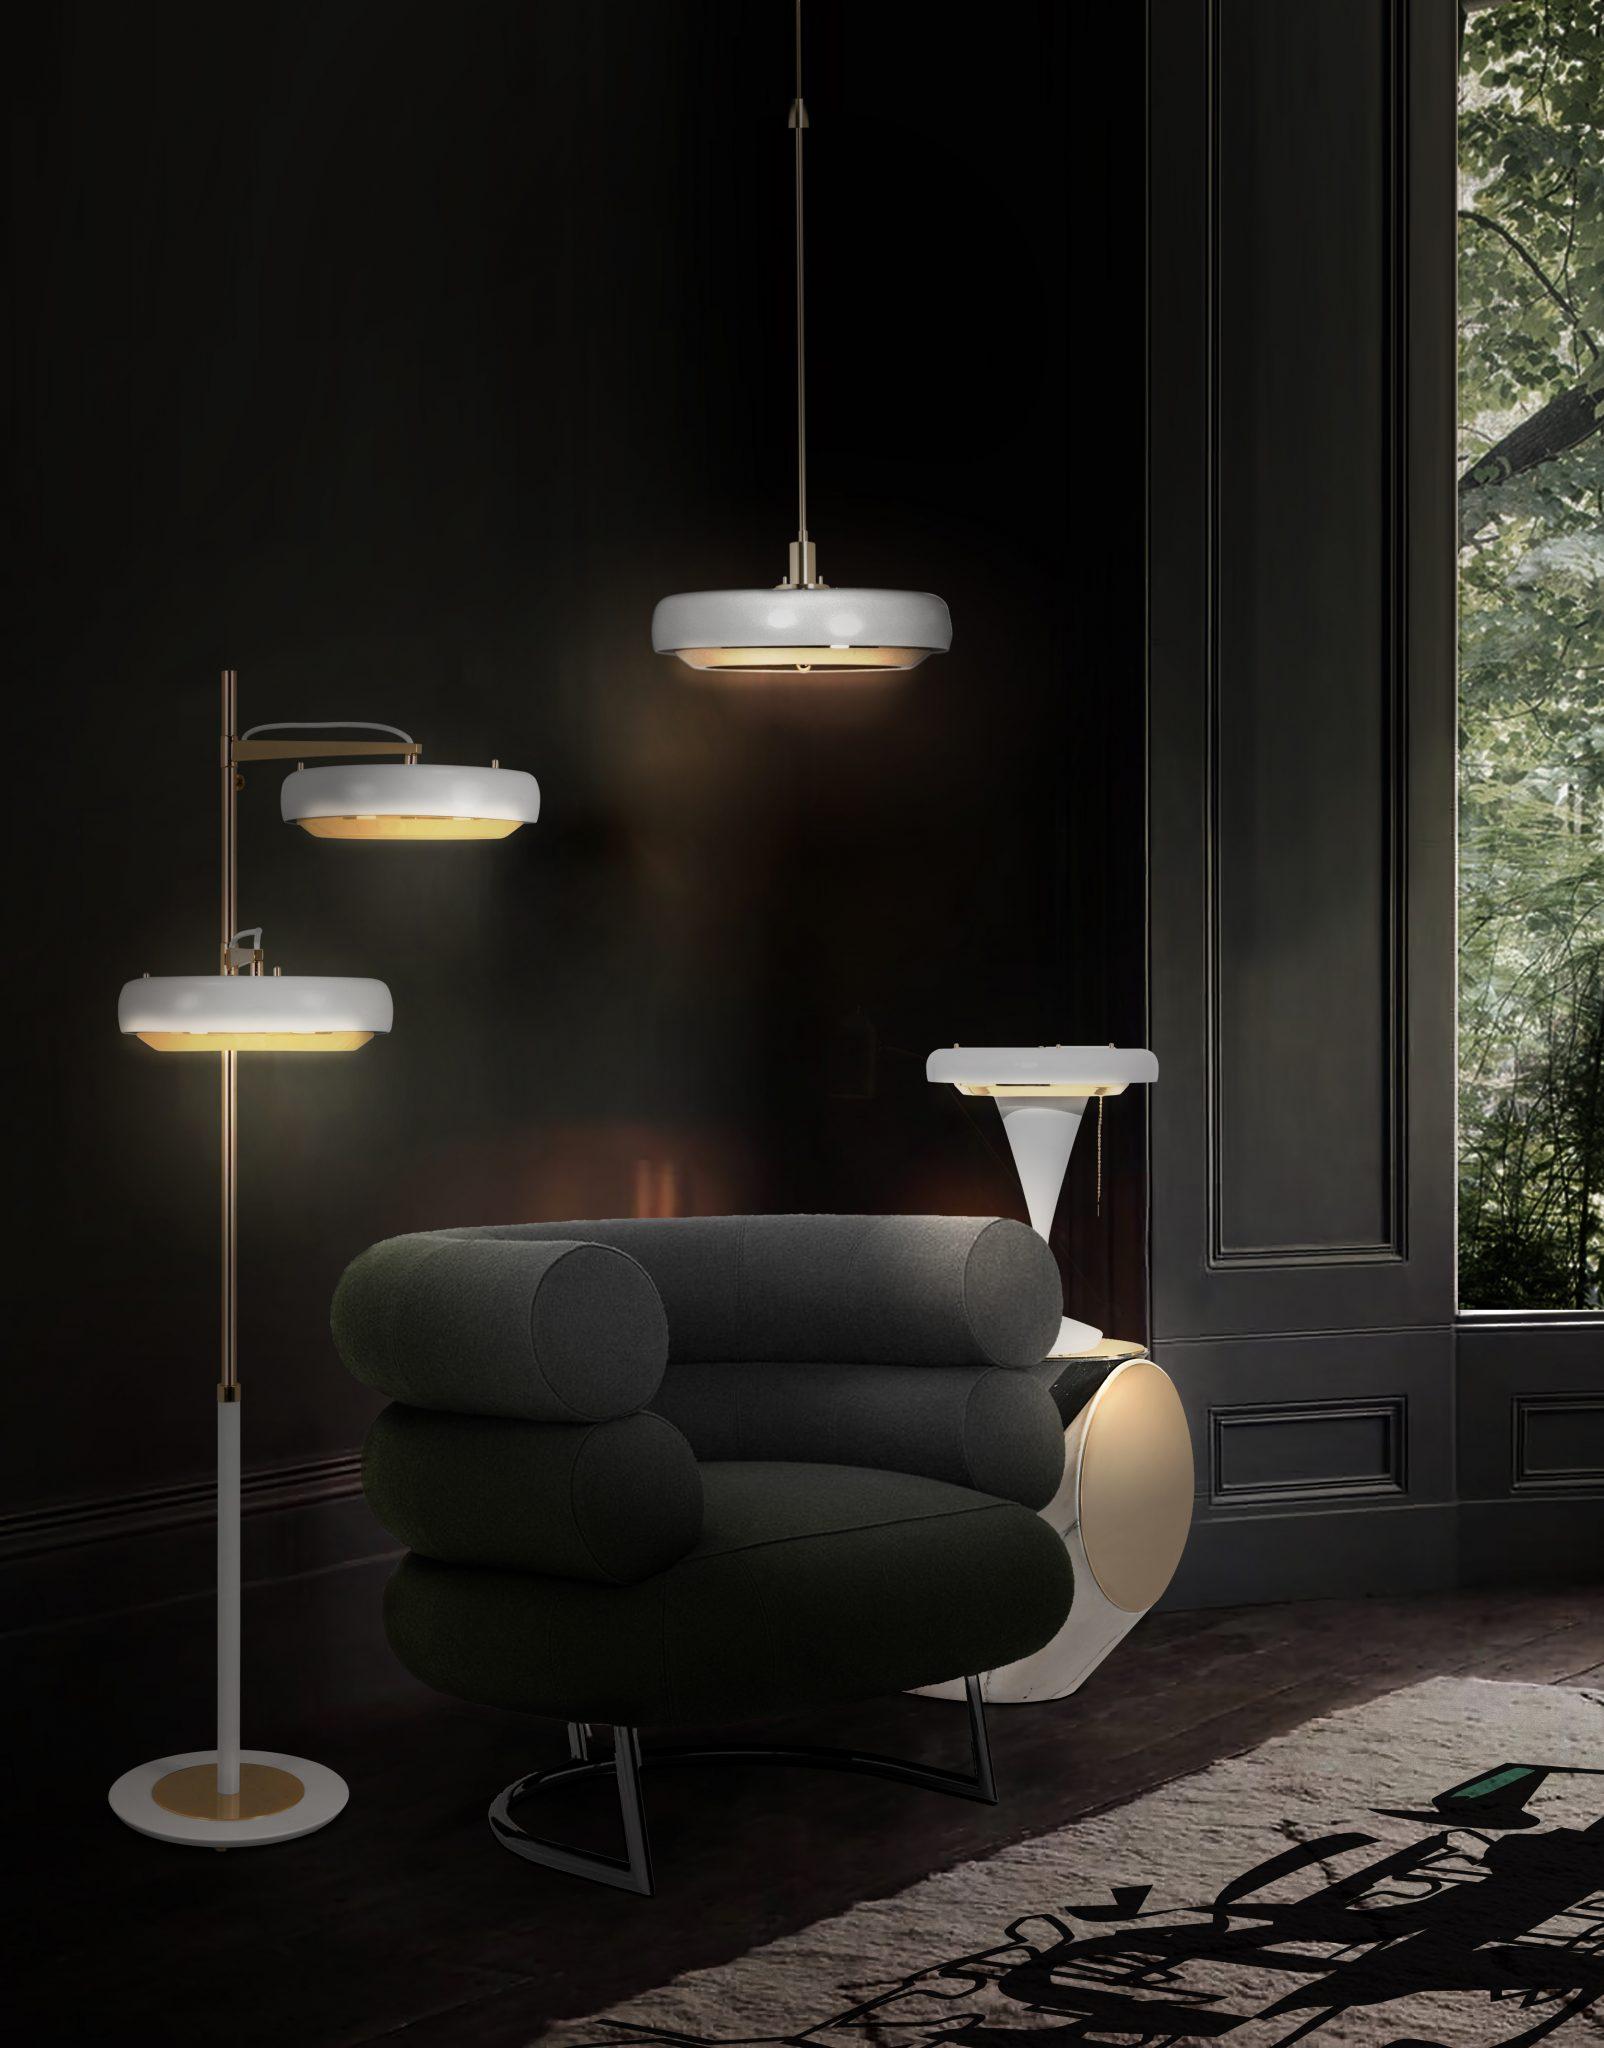 MODERN HOME DECOR WITH MEMORABLE LIGHTING DESIGN